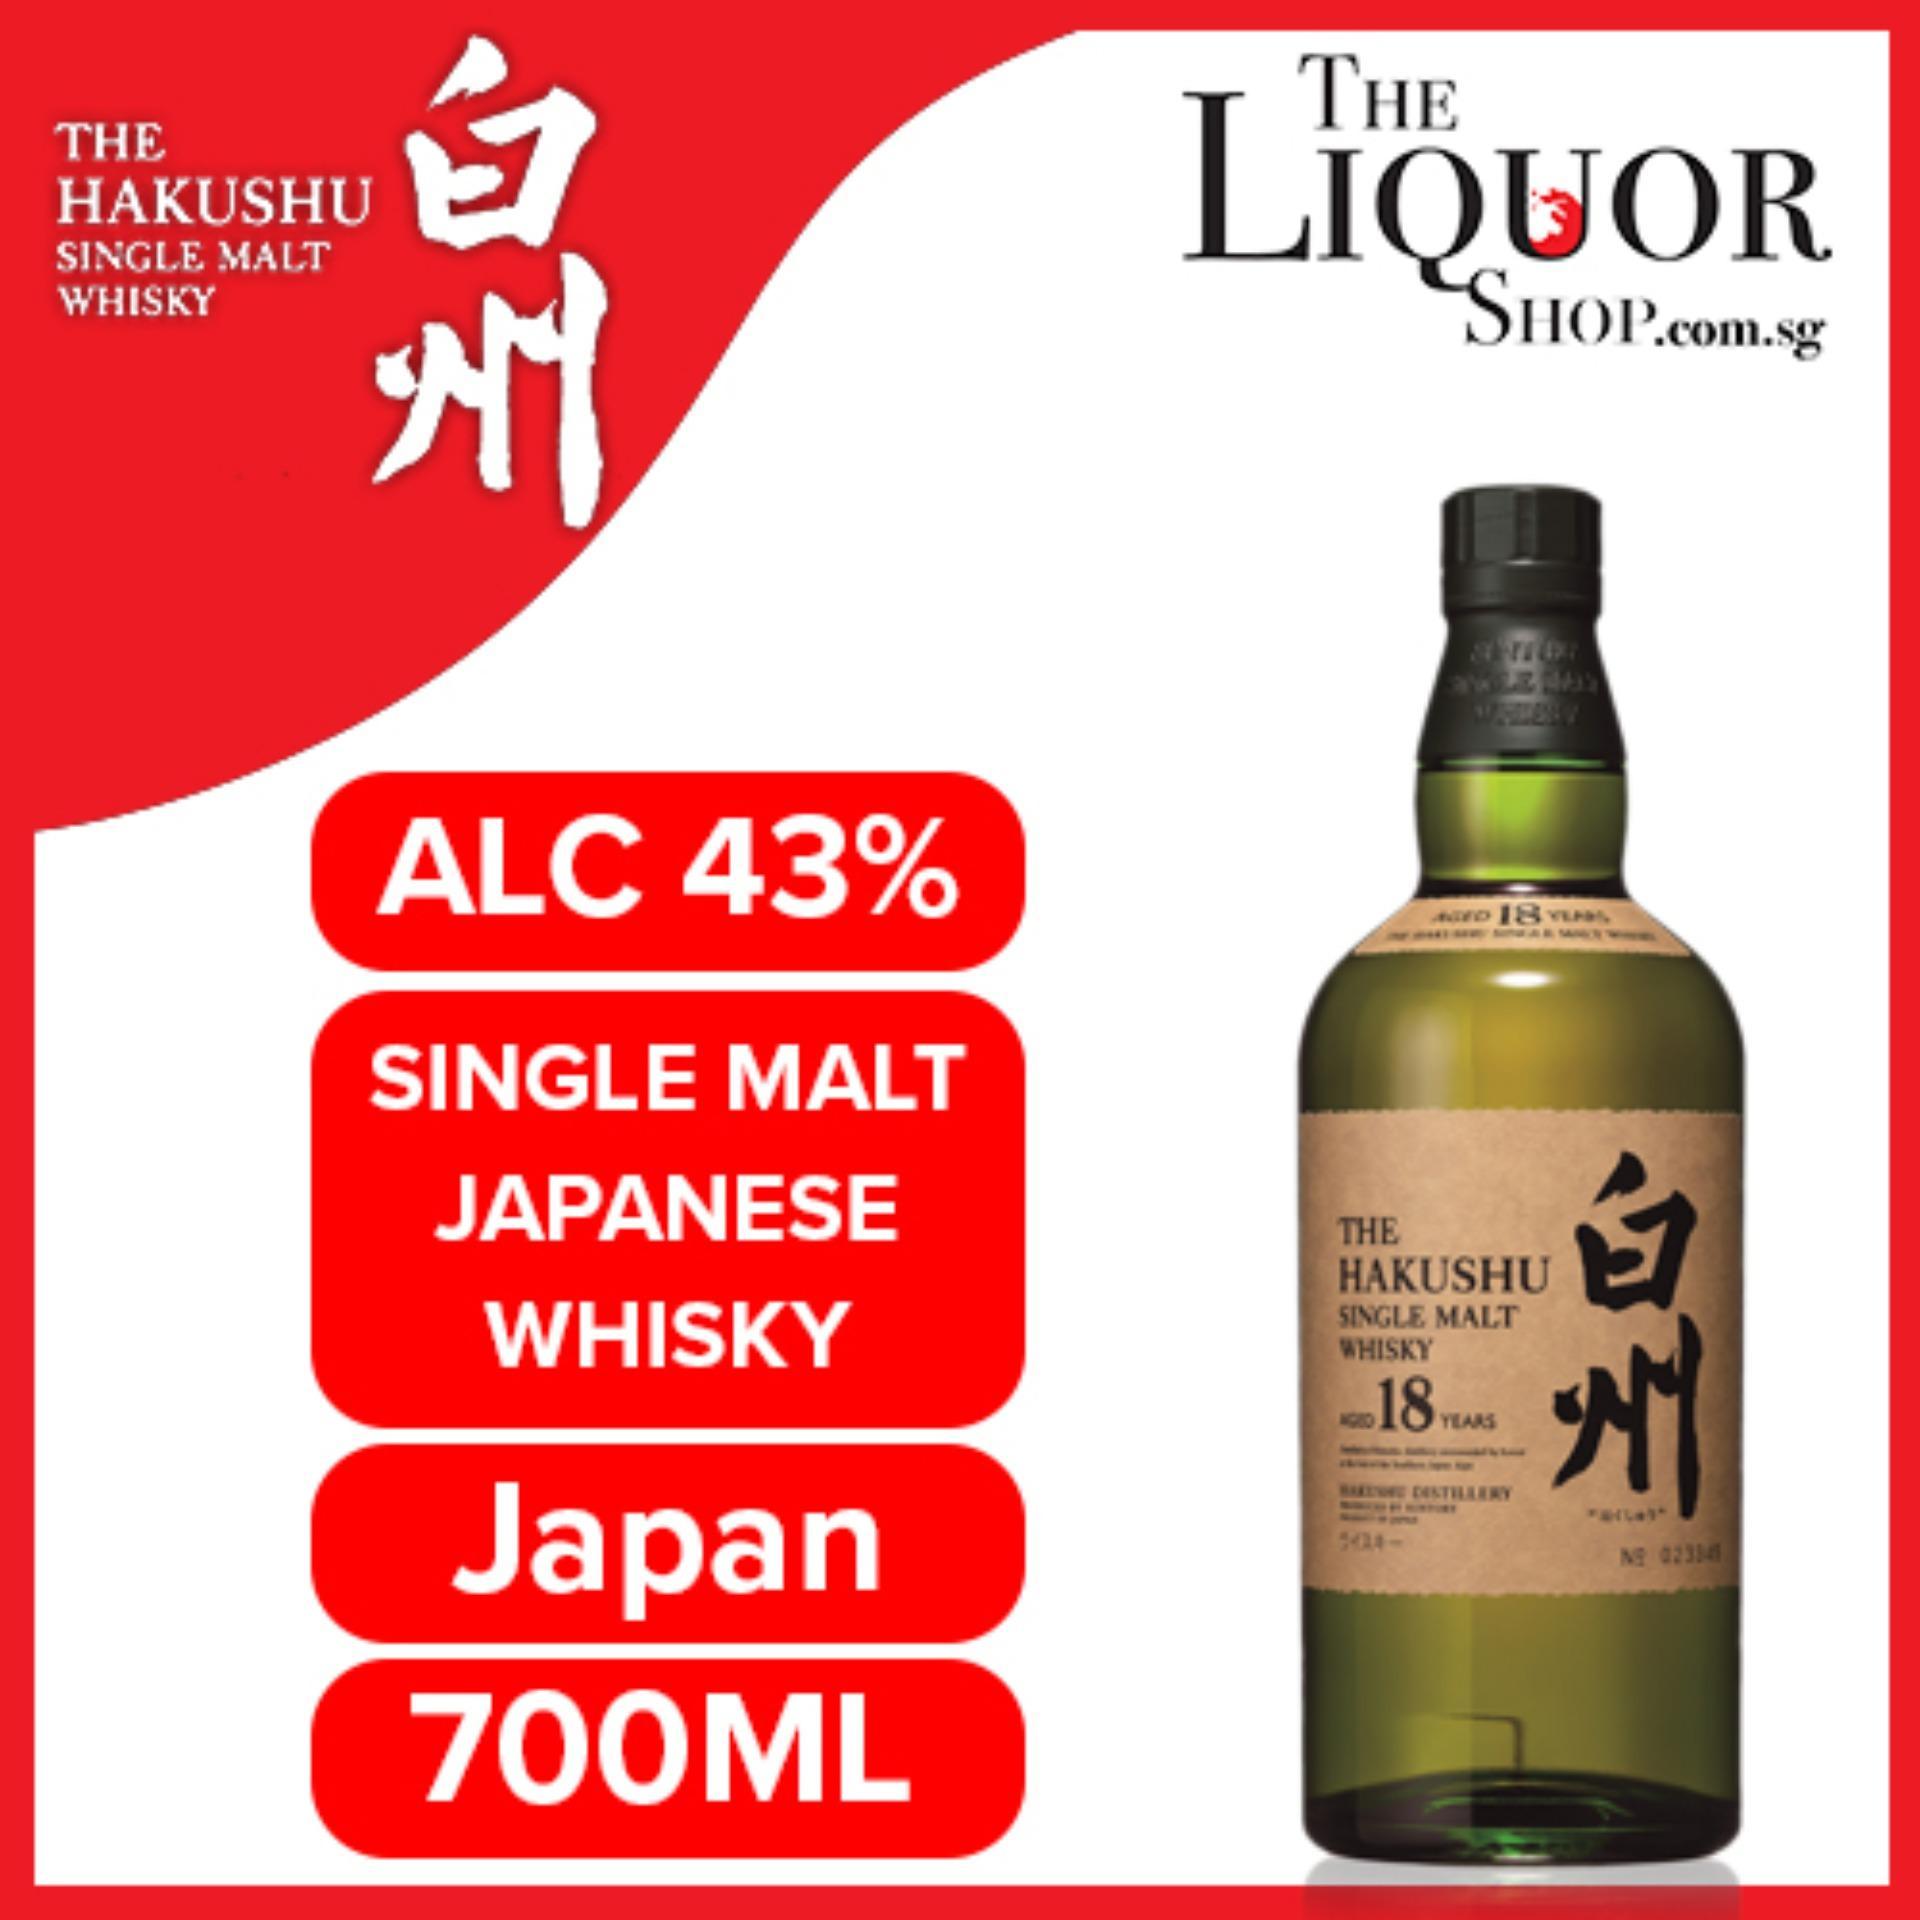 Hakushu 18 Years By The Liquor Shop.